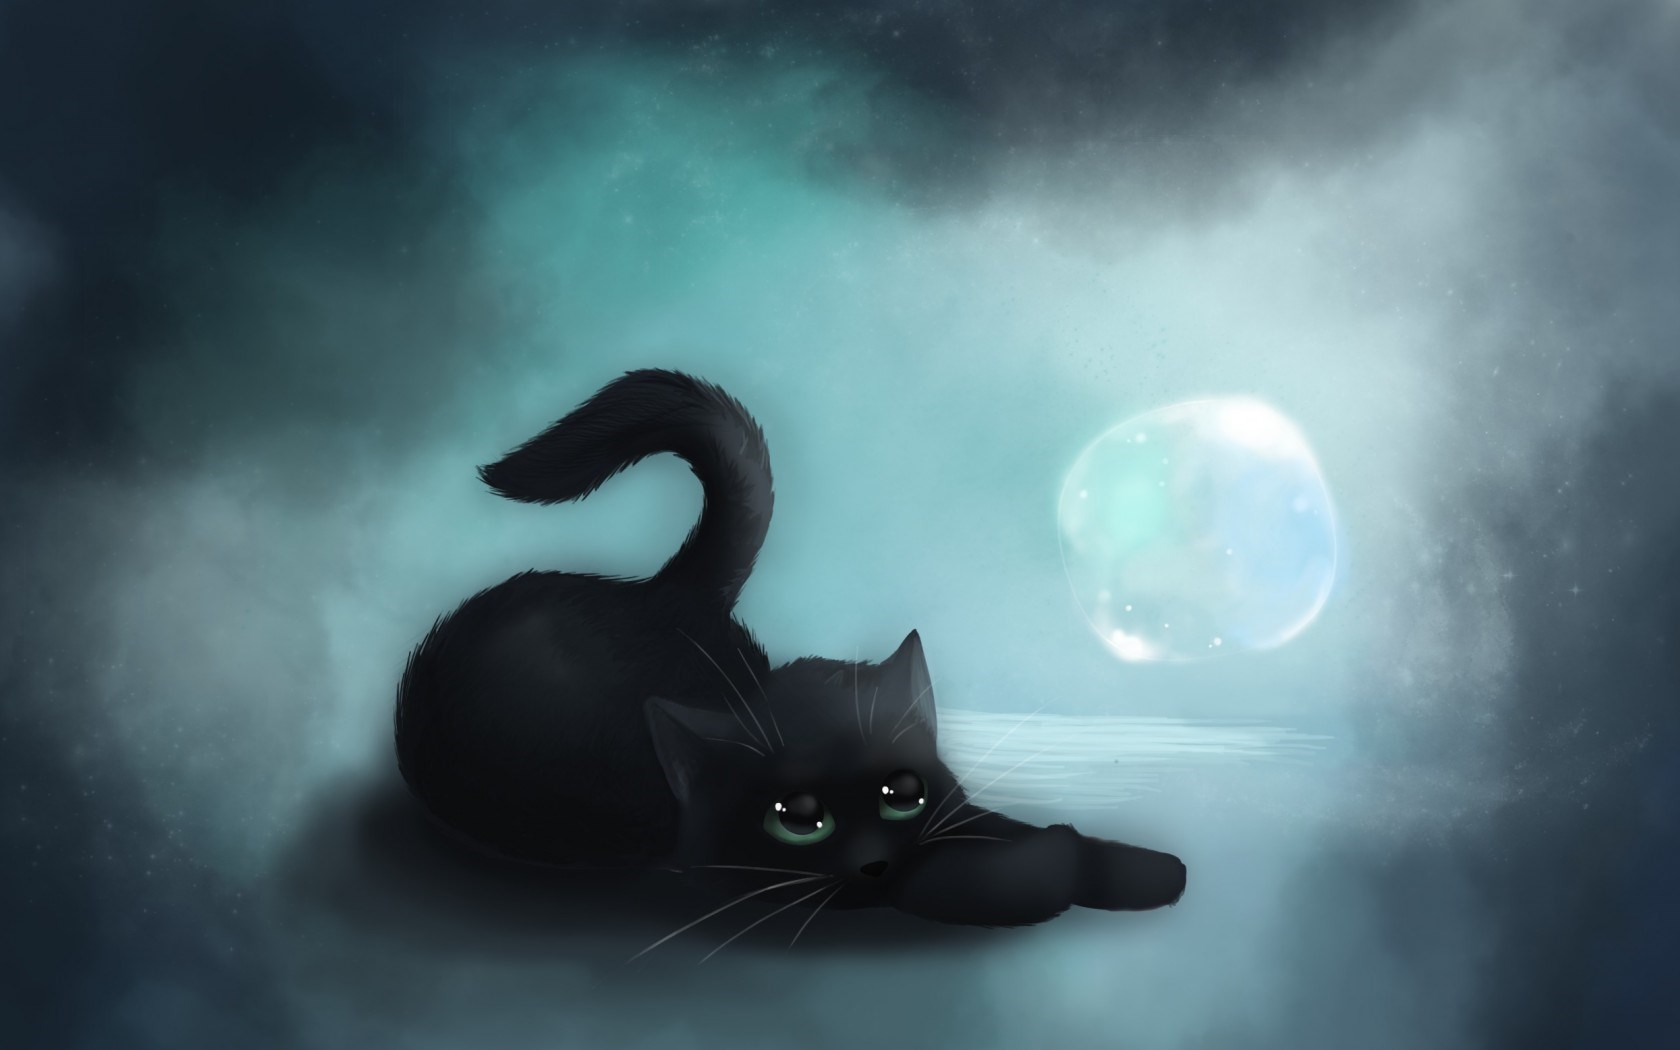 Cat Computer Wallpaper Cute Black Cat Background 3074990 Hd Wallpaper Backgrounds Download